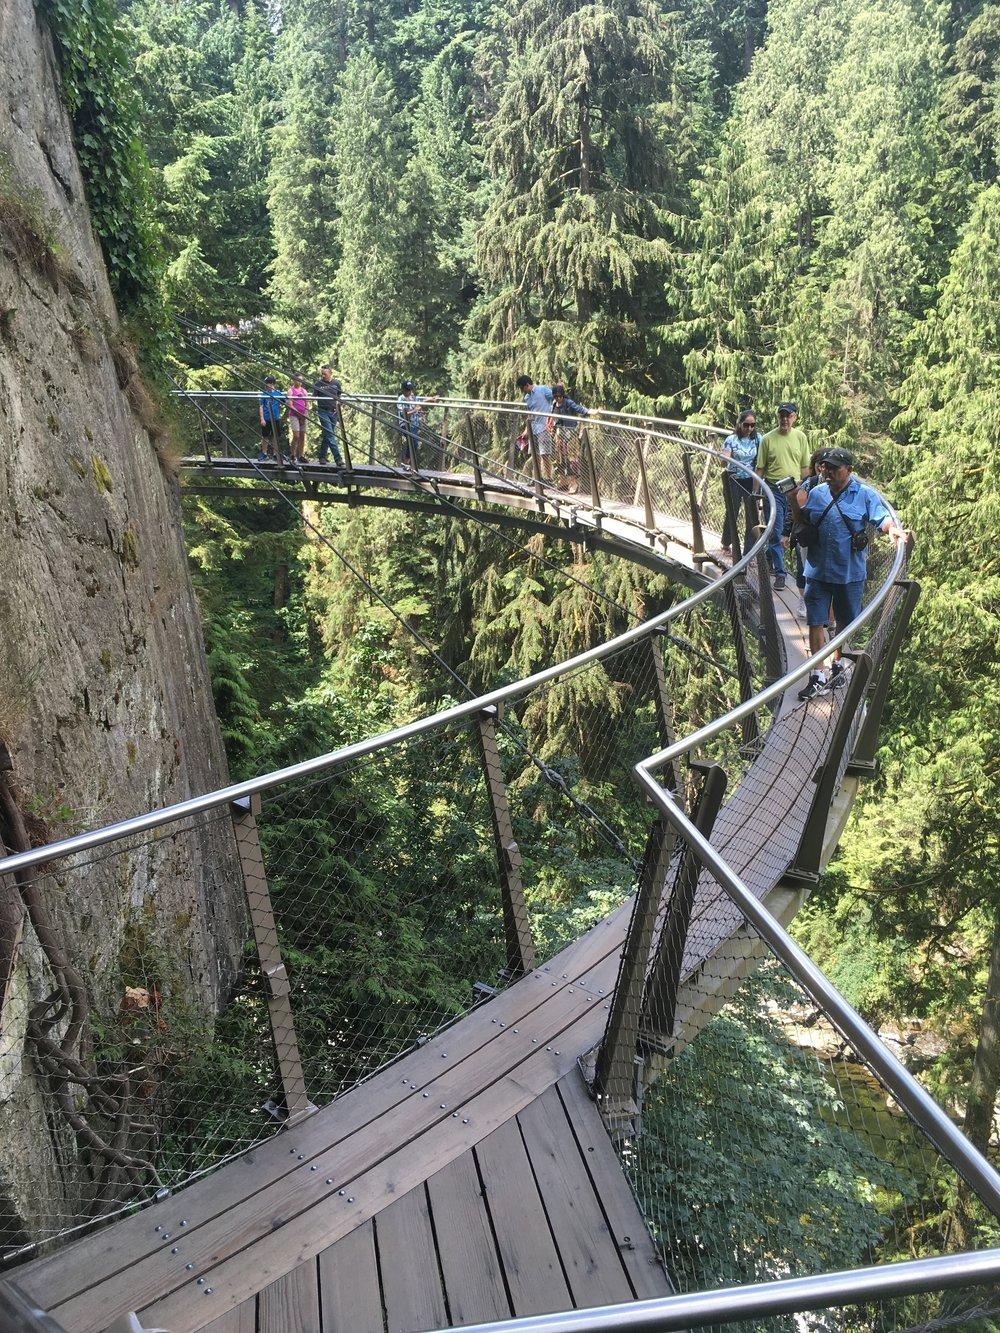 The rock-mounted suspension bridge at Capilano Park